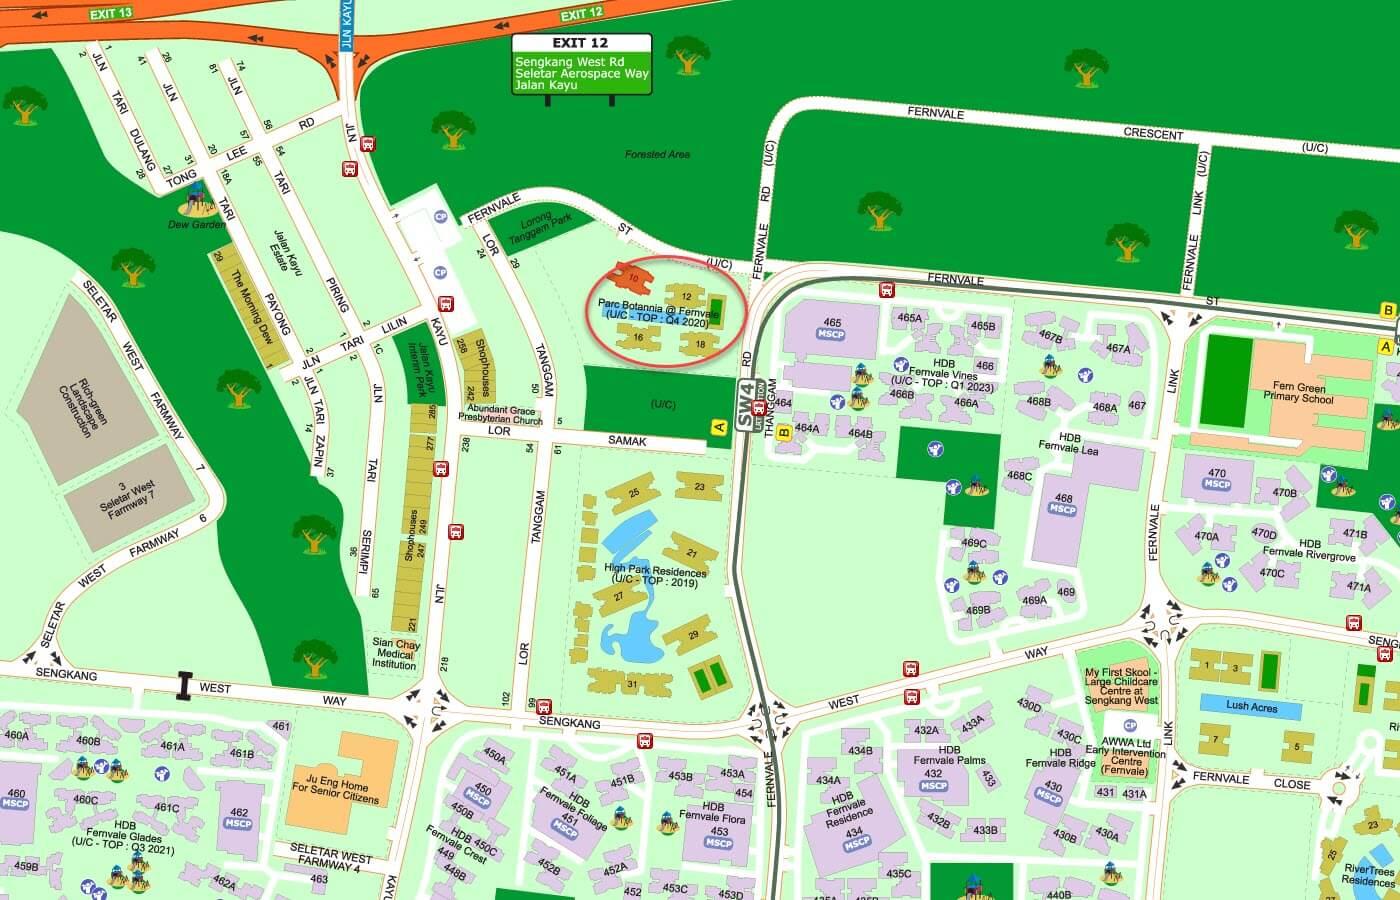 Parc Botannia Condo Street Directory Map